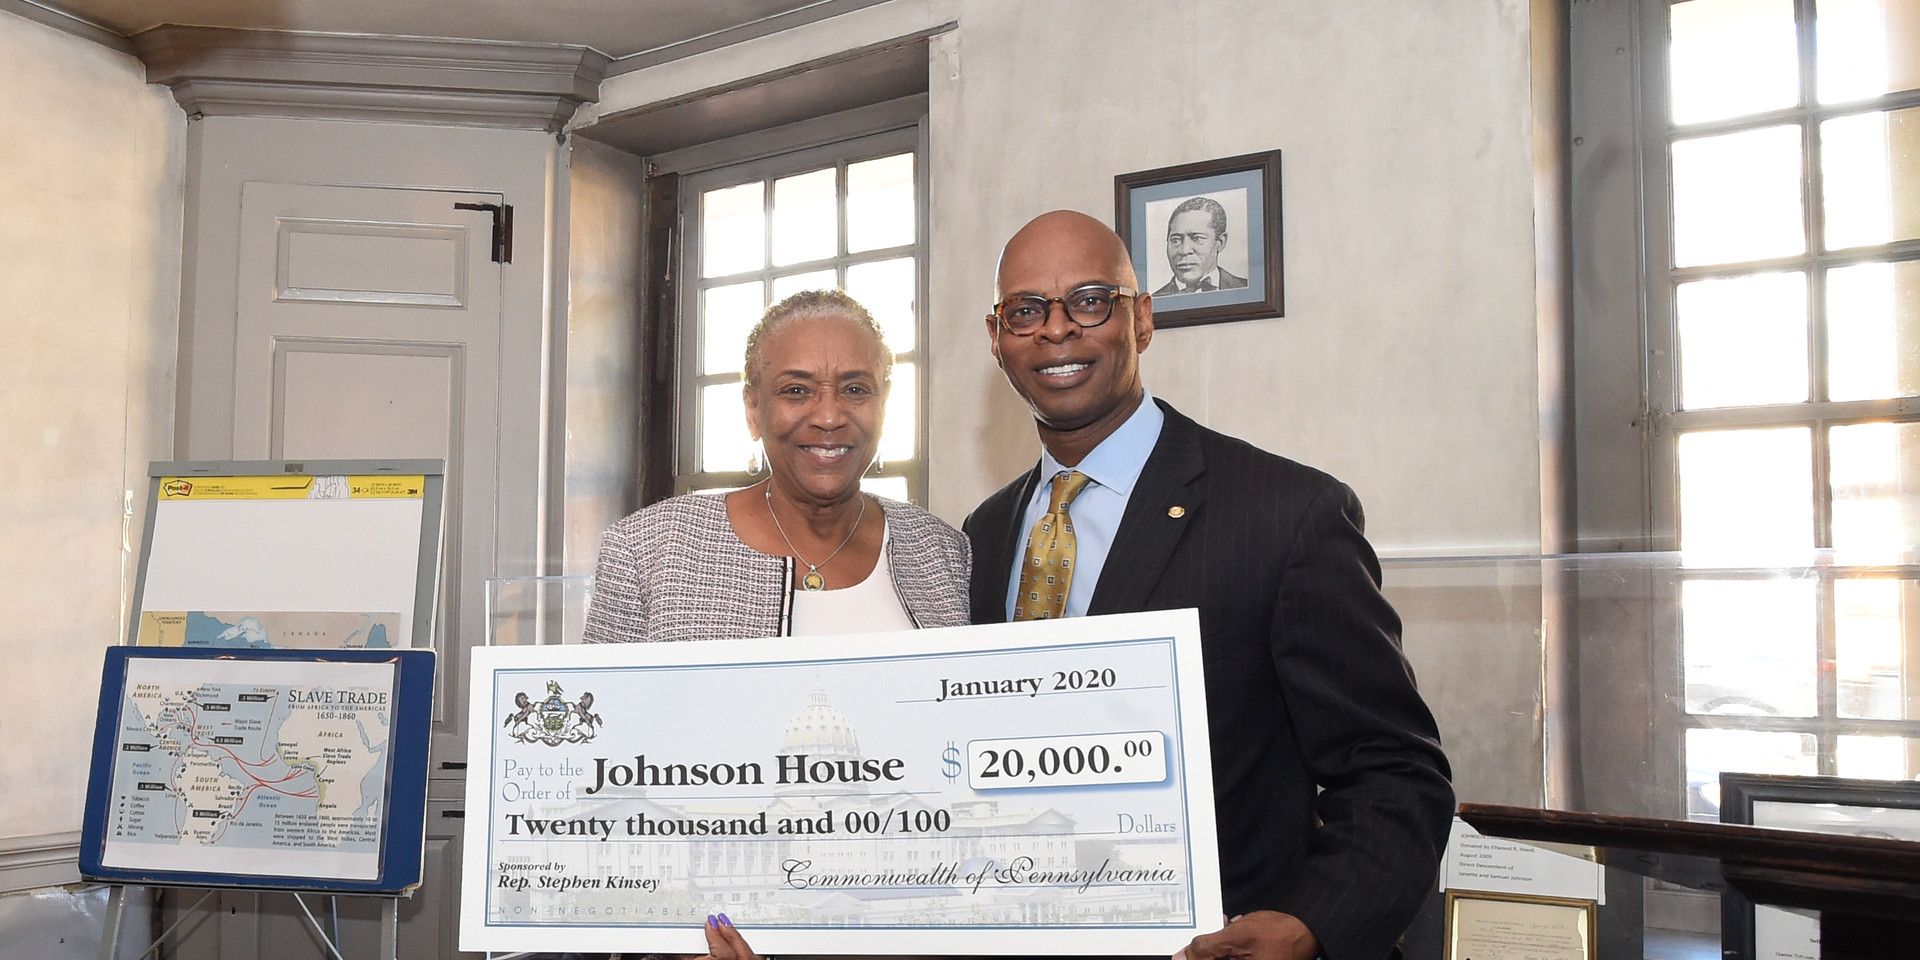 JohnsonHouse.JPG